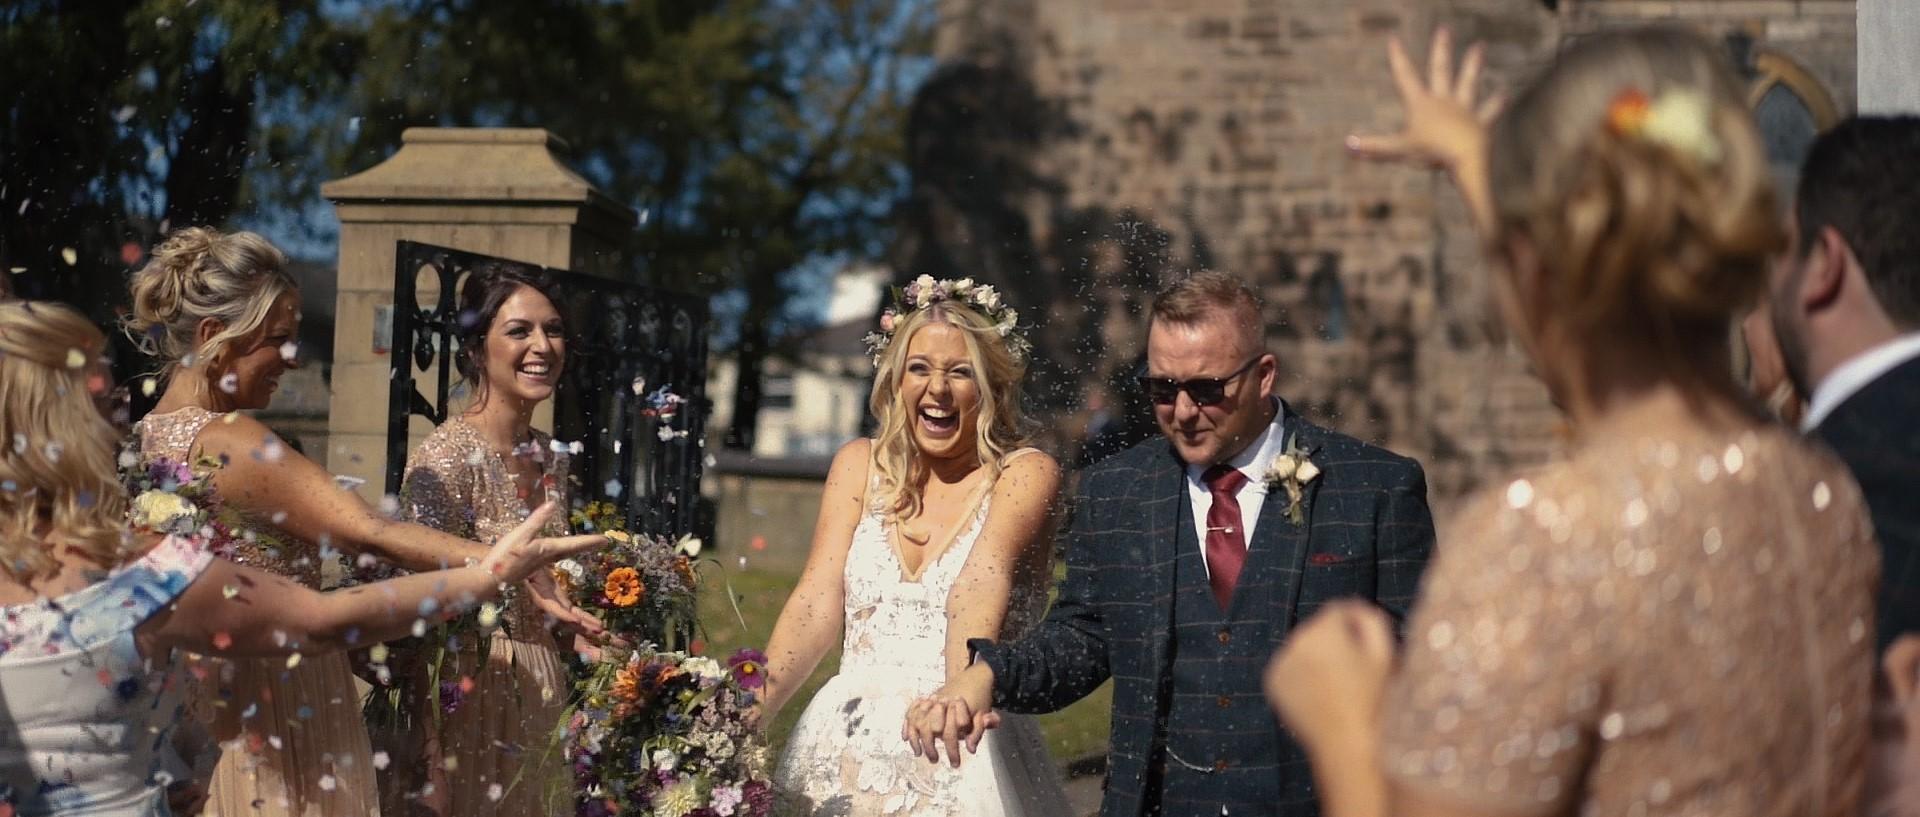 Lancashire wedding video Dan + Vicki capture